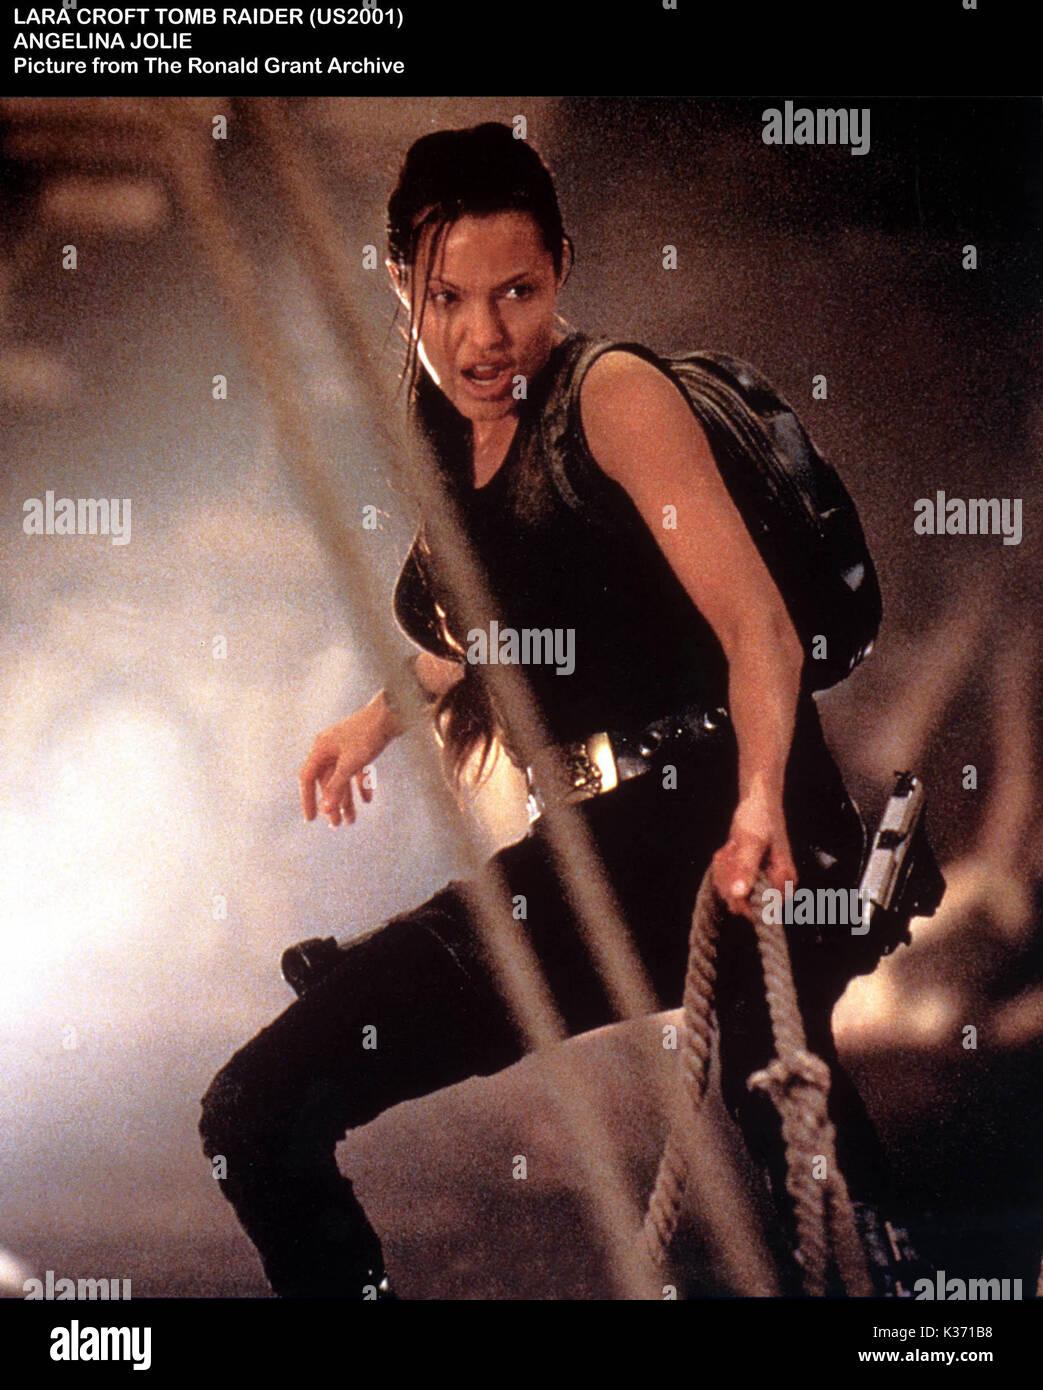 LARA CROFT: TOMB RAIDER ANGELINA JOLIE     Date: 2001 - Stock Image